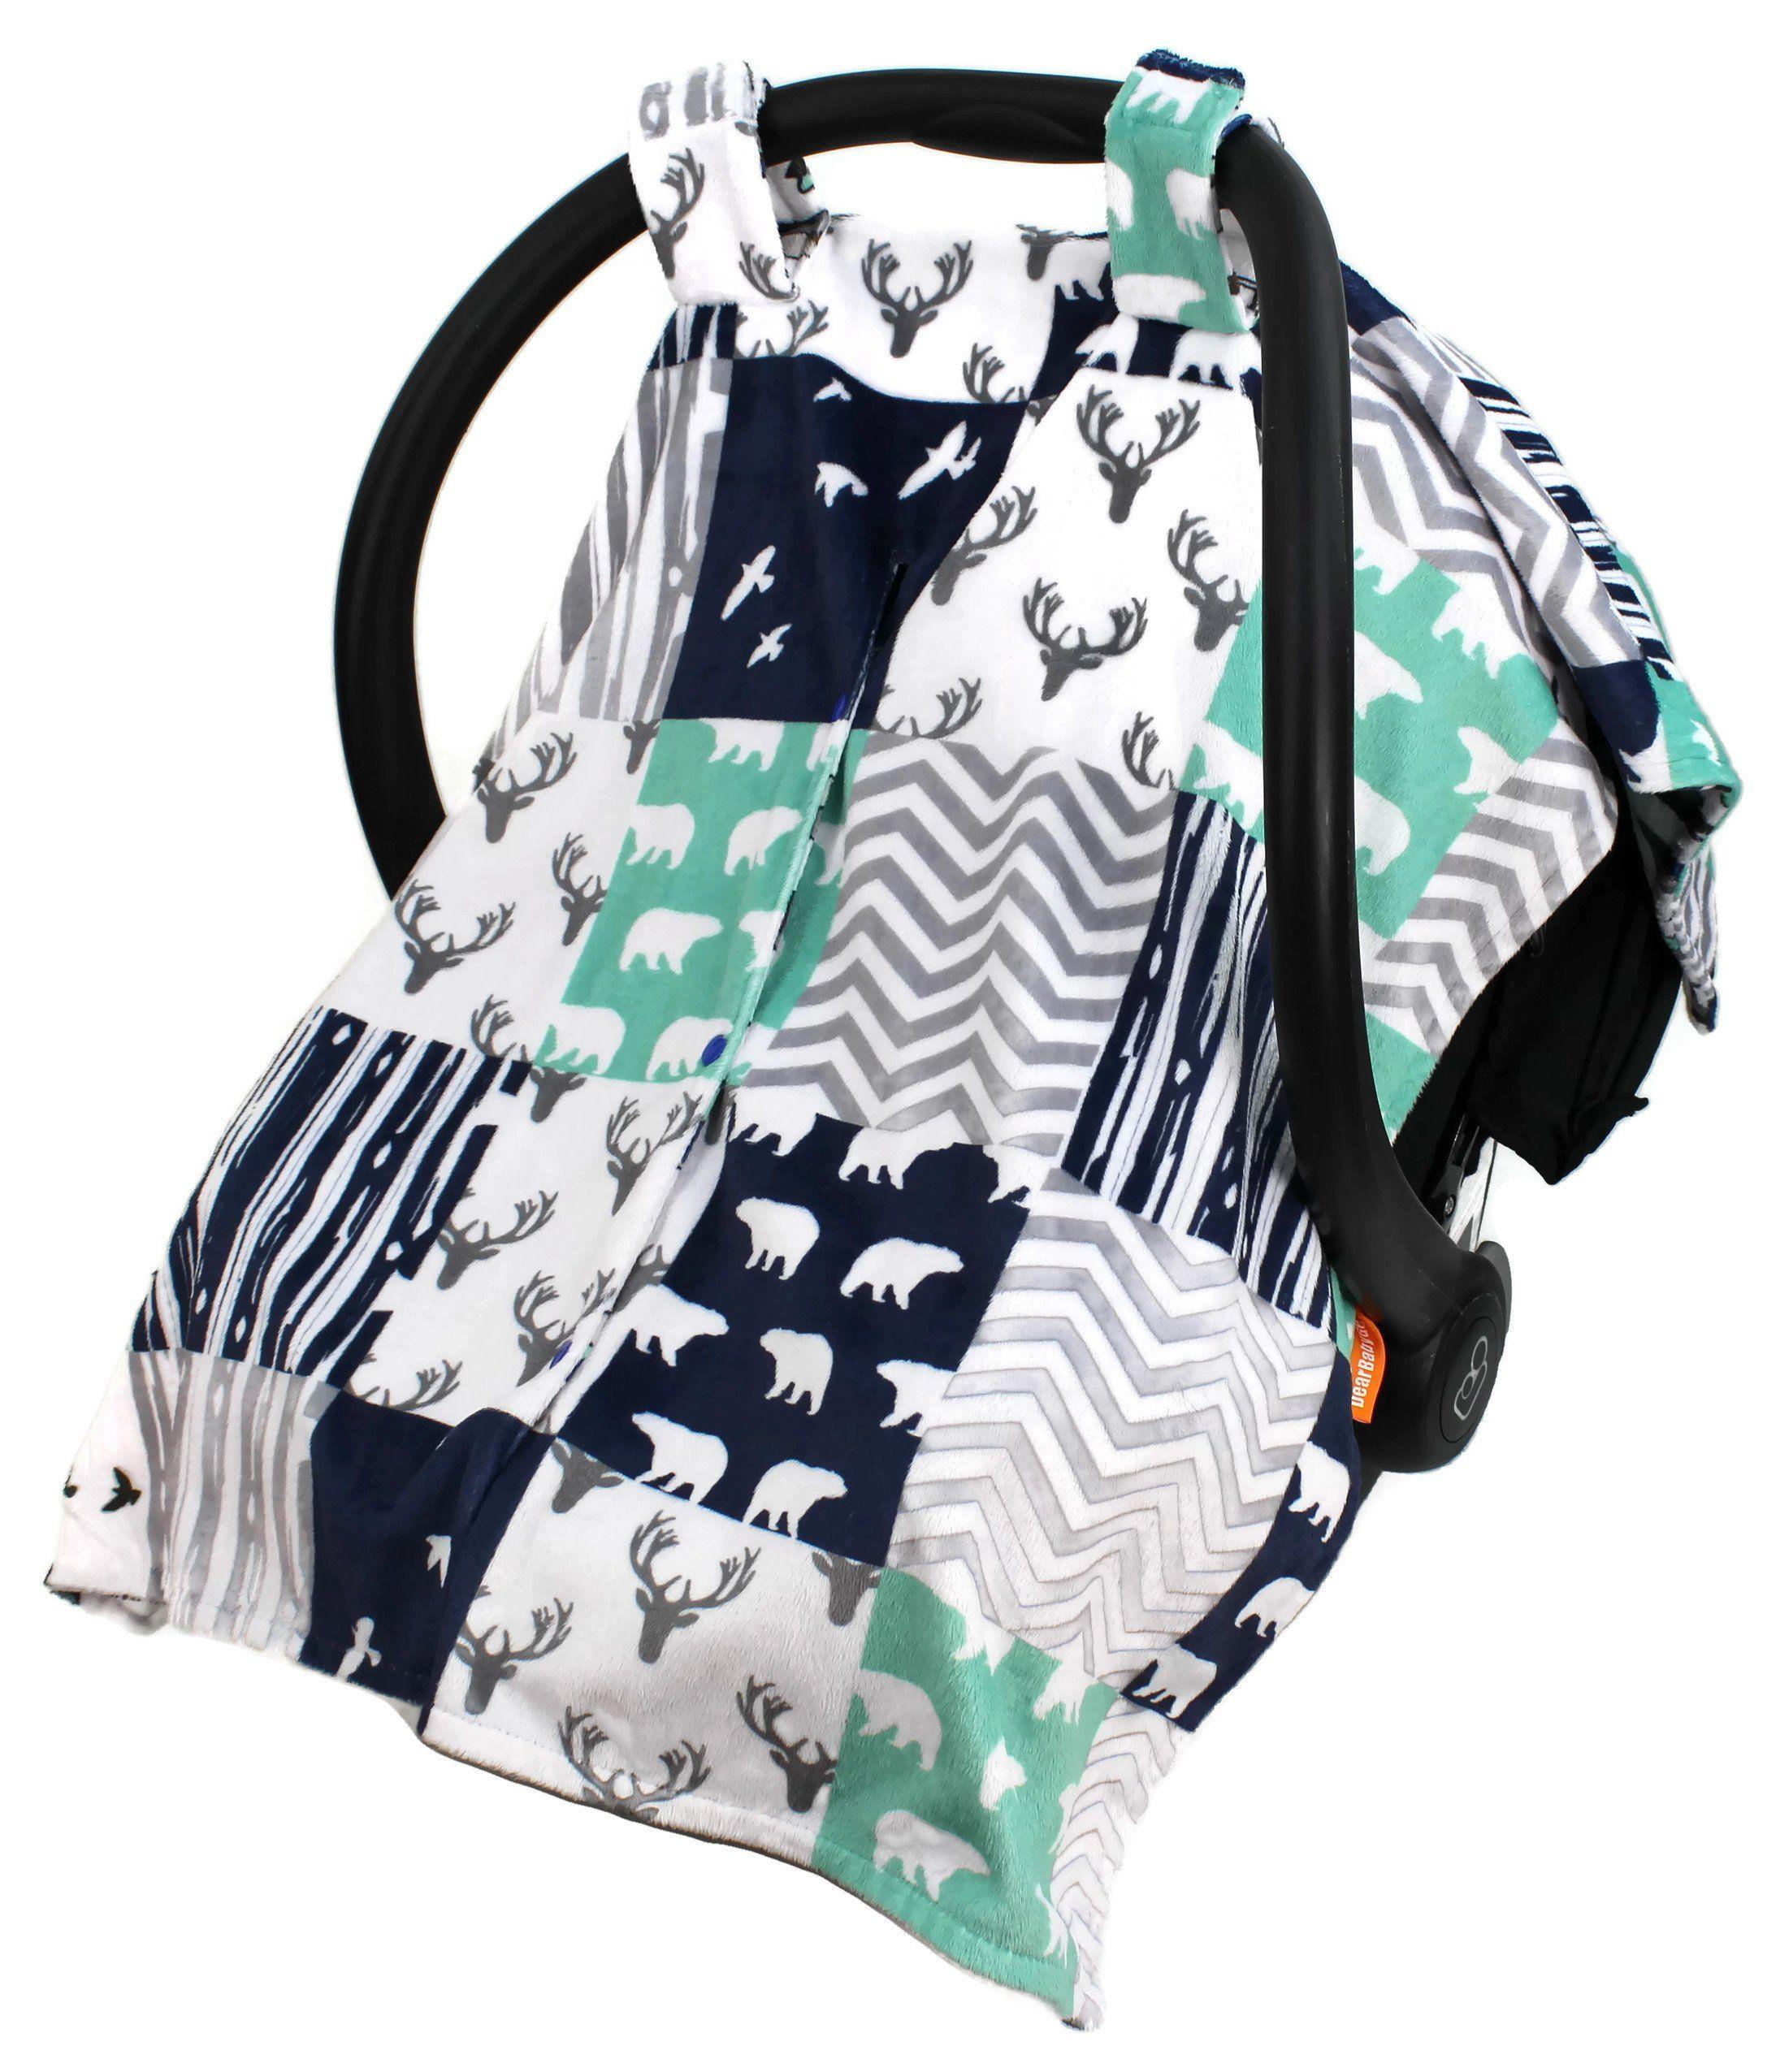 Dear Baby Gear Deluxe Reversible Car Seat Canopy Woodland Bear Quilt Feathers Navy Mint Custom Minky Print